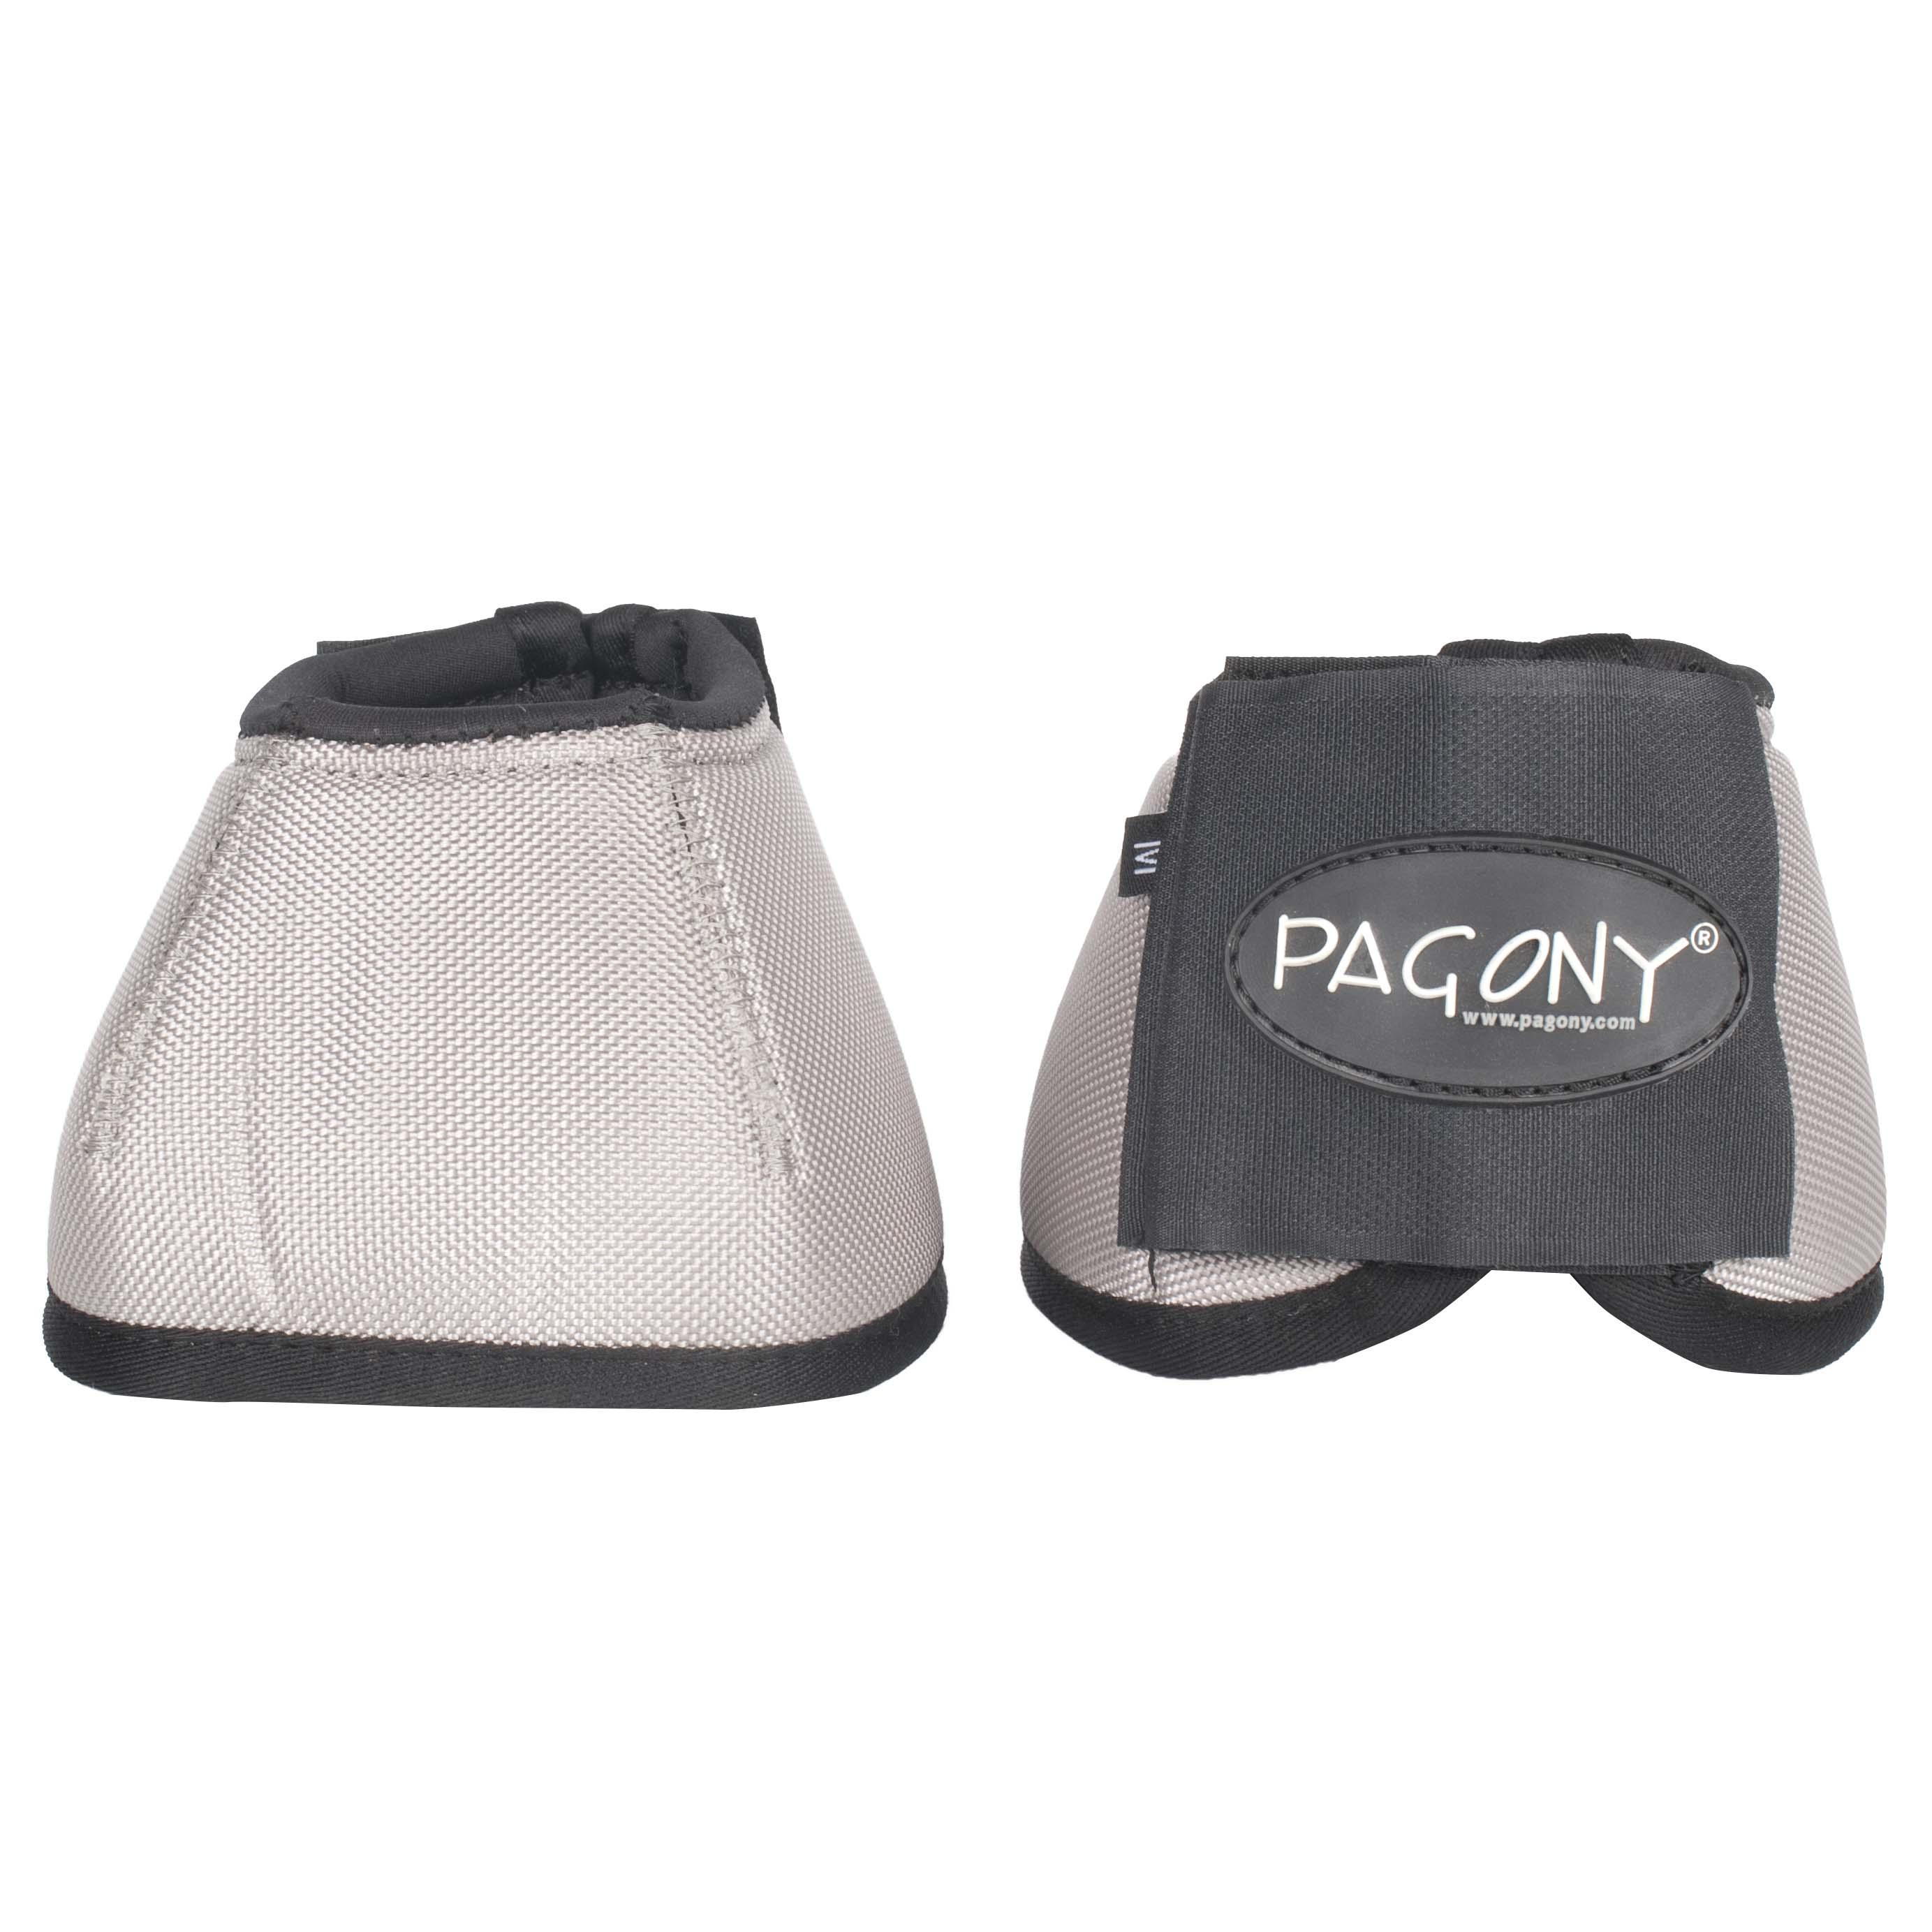 Pagony Champion springschoenen donkergrijs maat:s